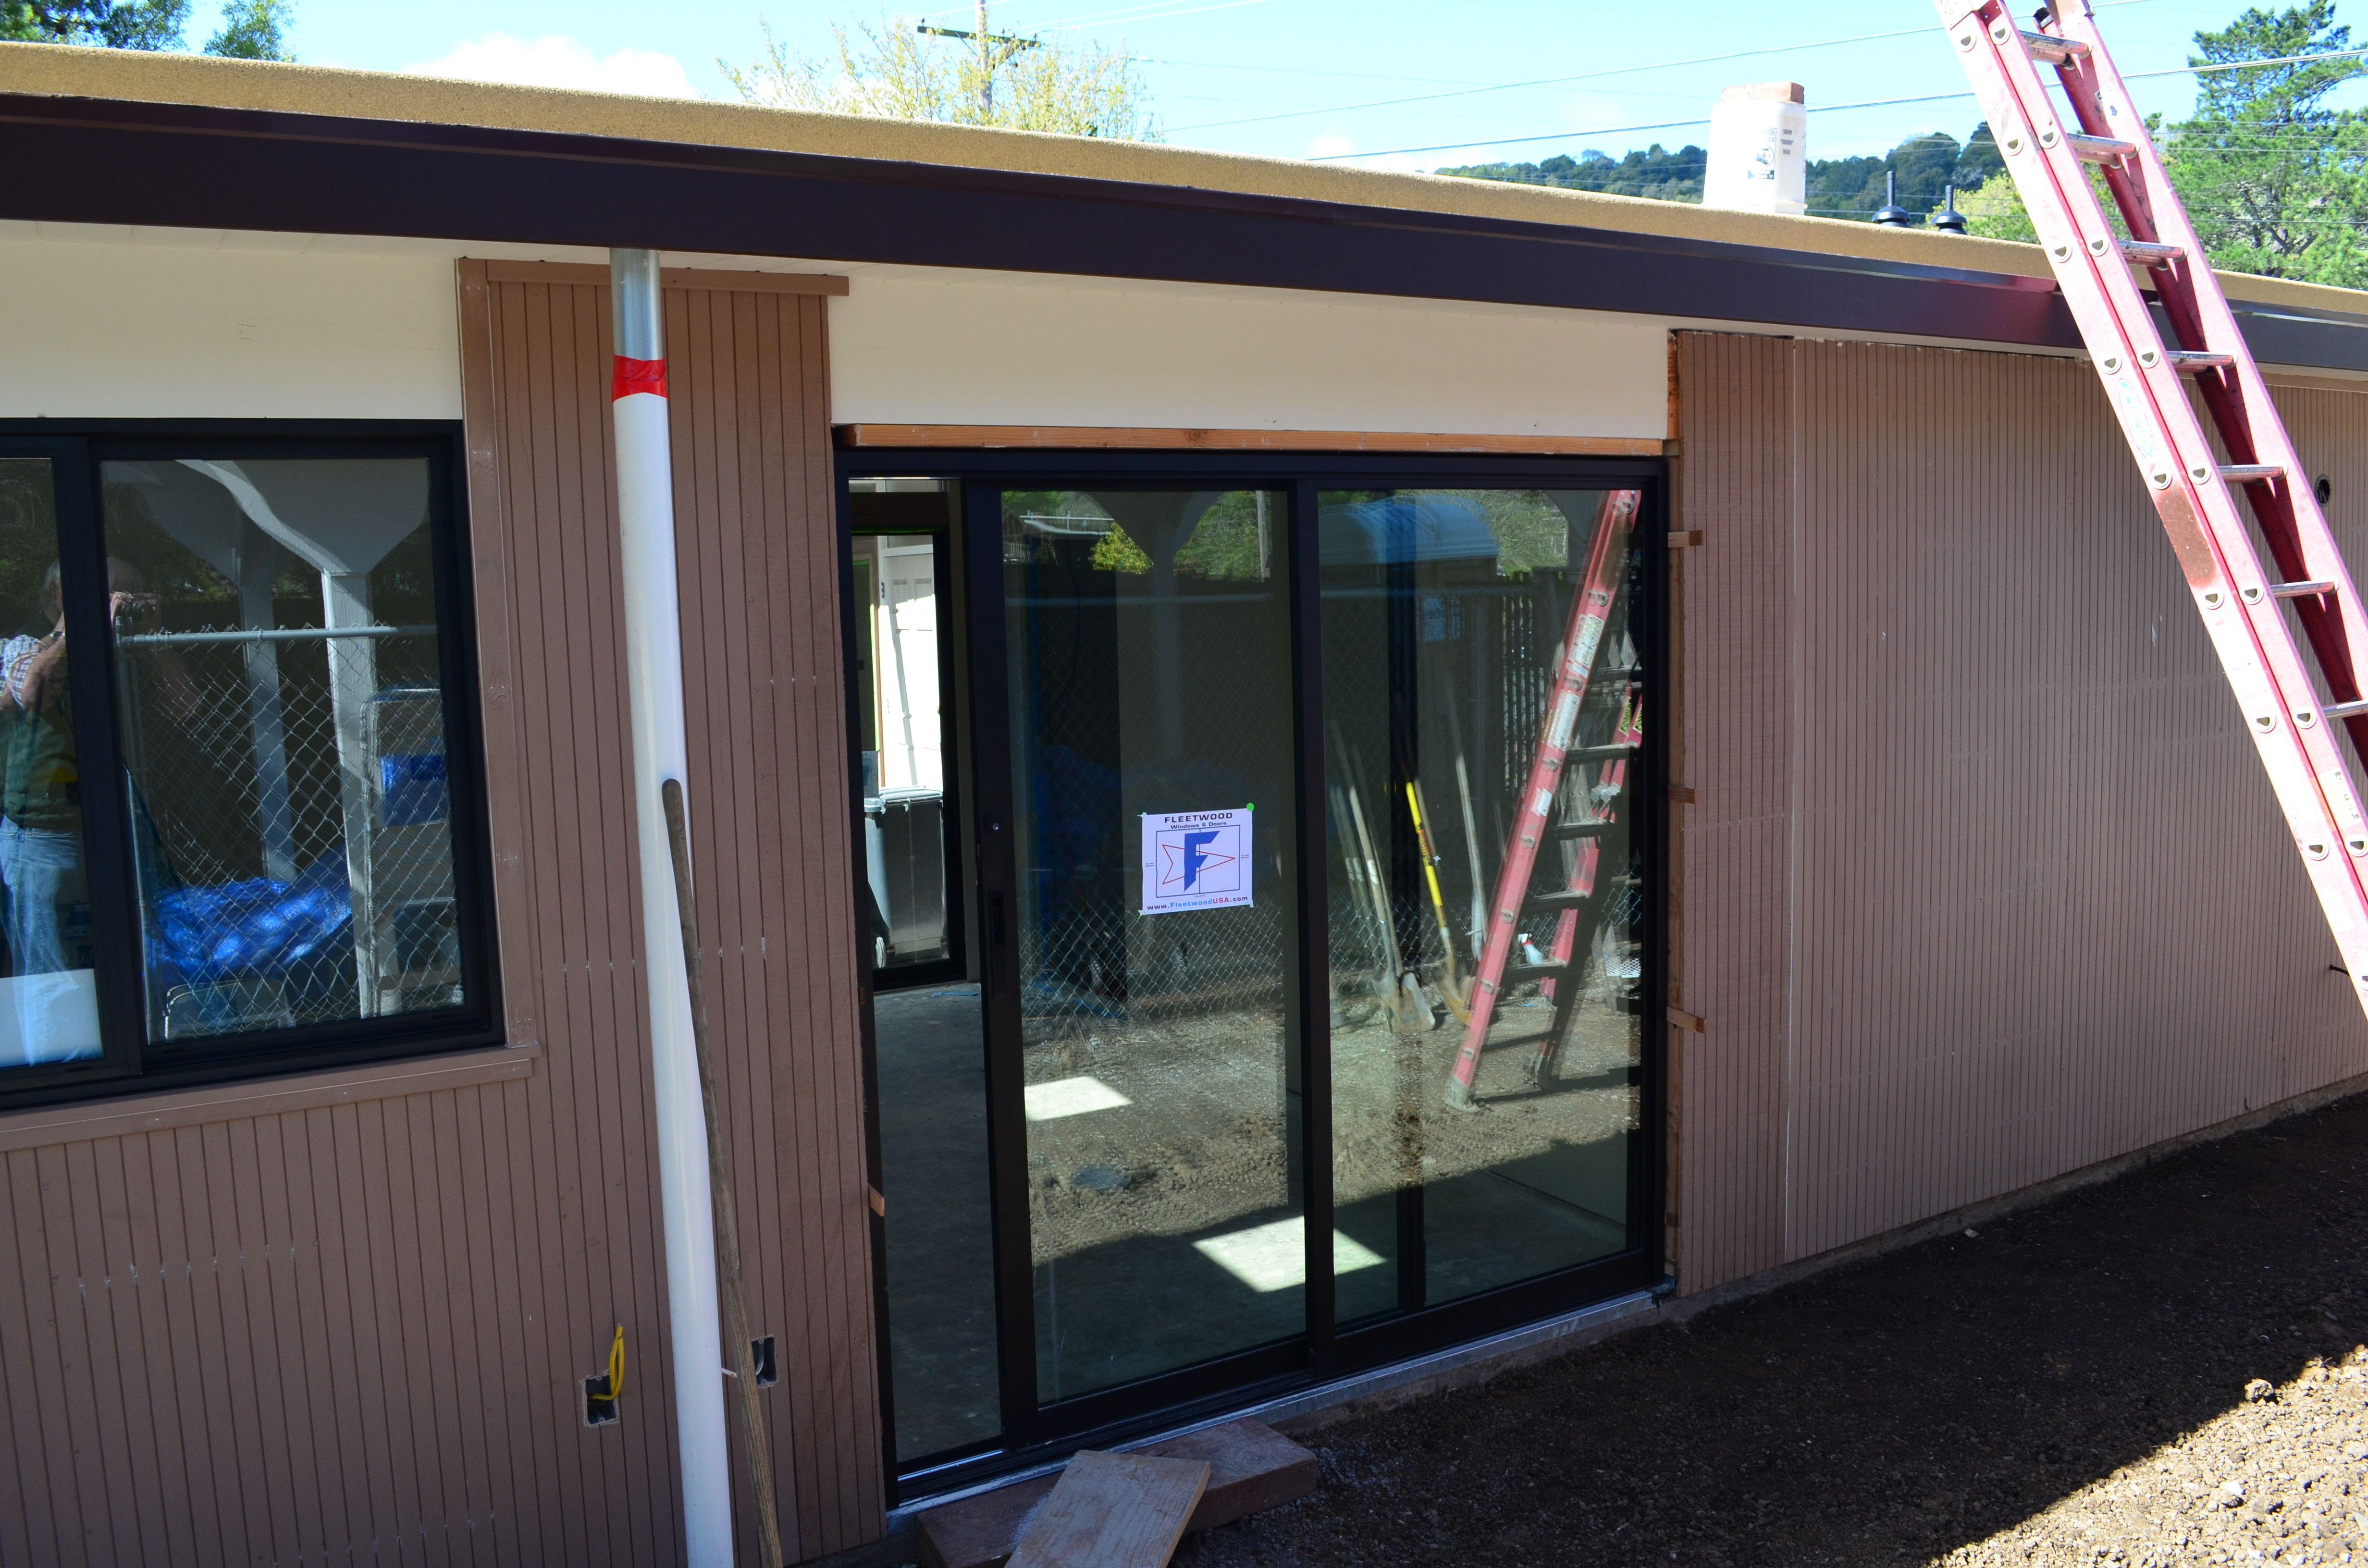 Milgard Aluminum Windows   Posts From The U0027Fleetwood Windows And Doorsu0027  Category